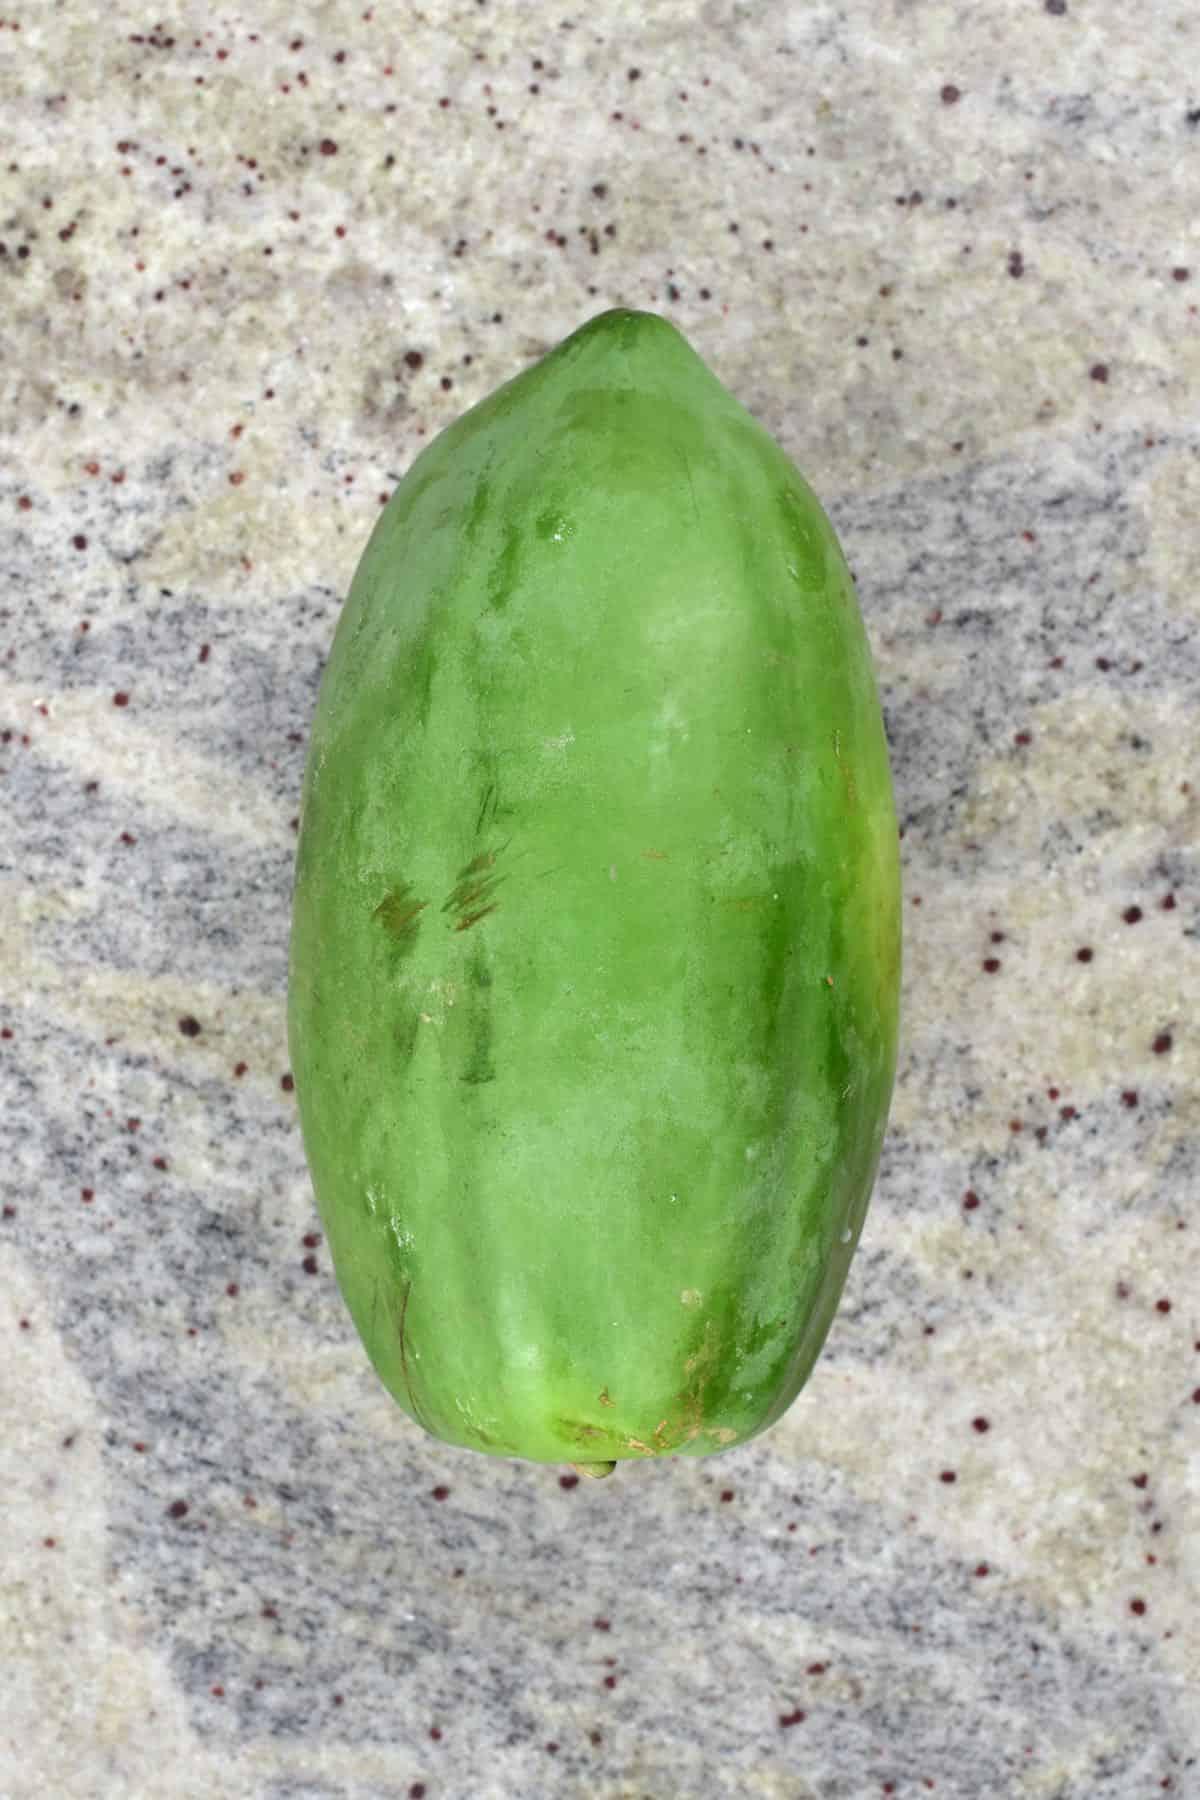 Green papaya on a flat surface